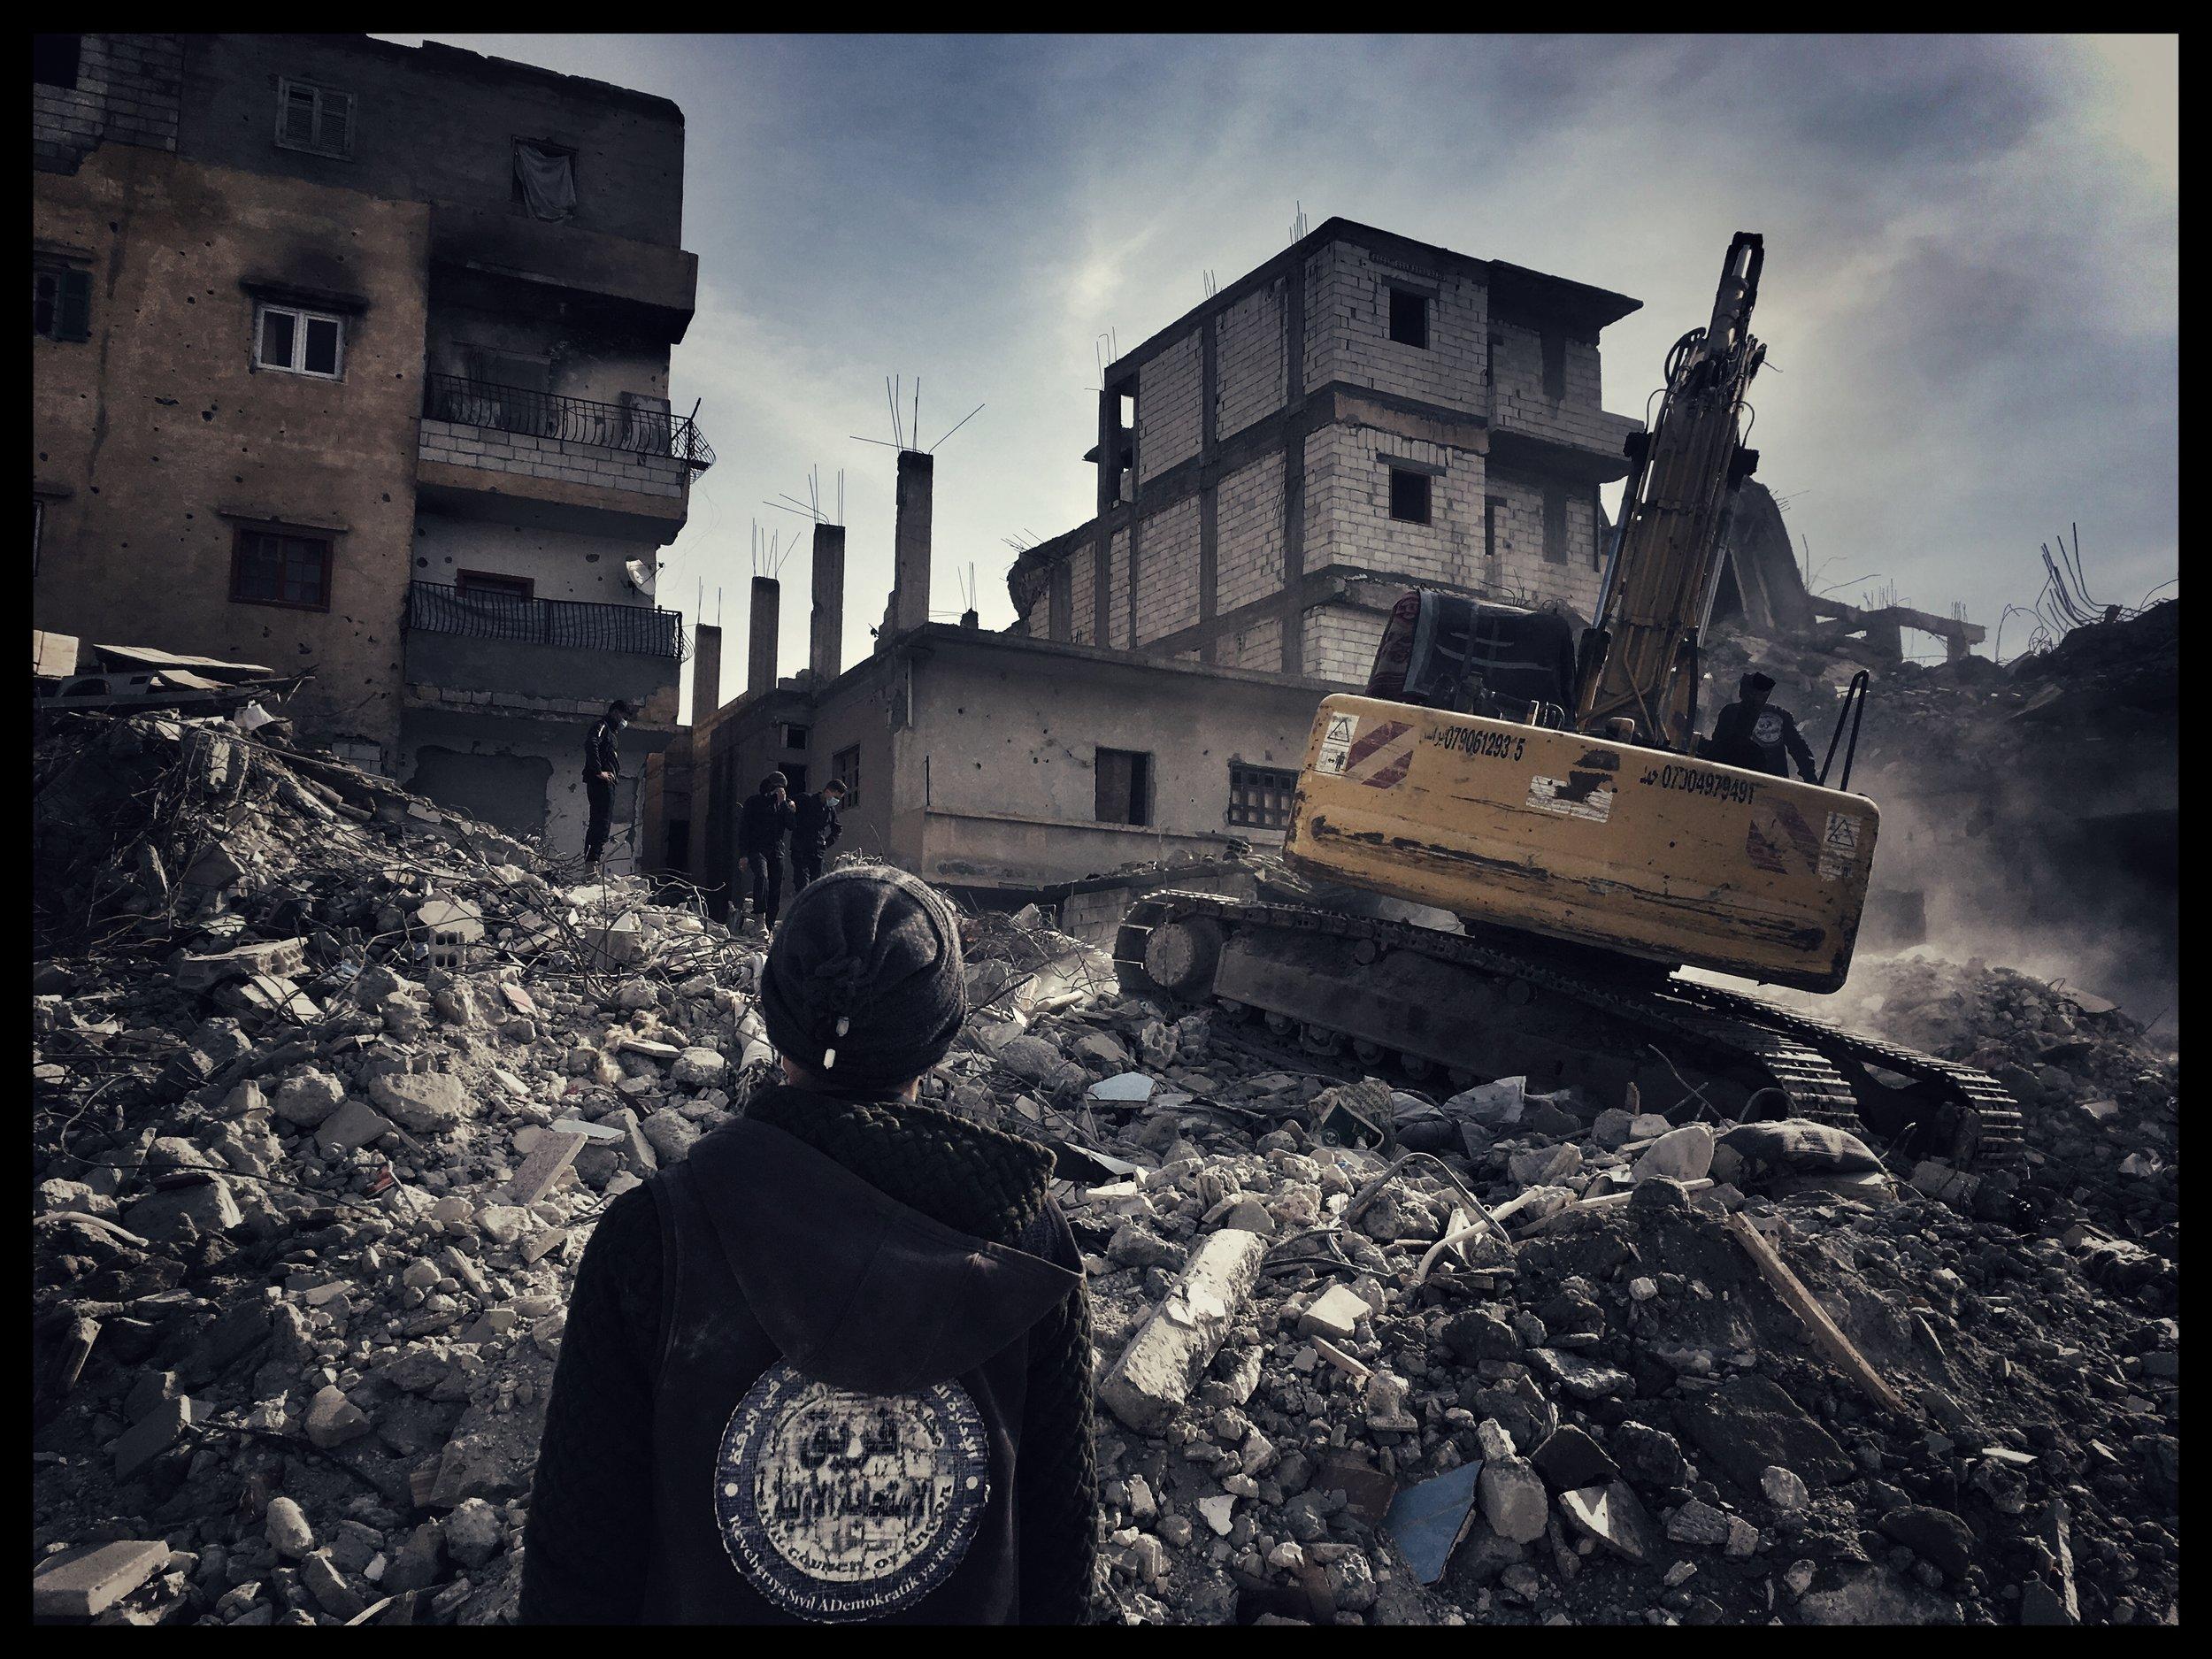 Raqqah in Ruins 4.JPG